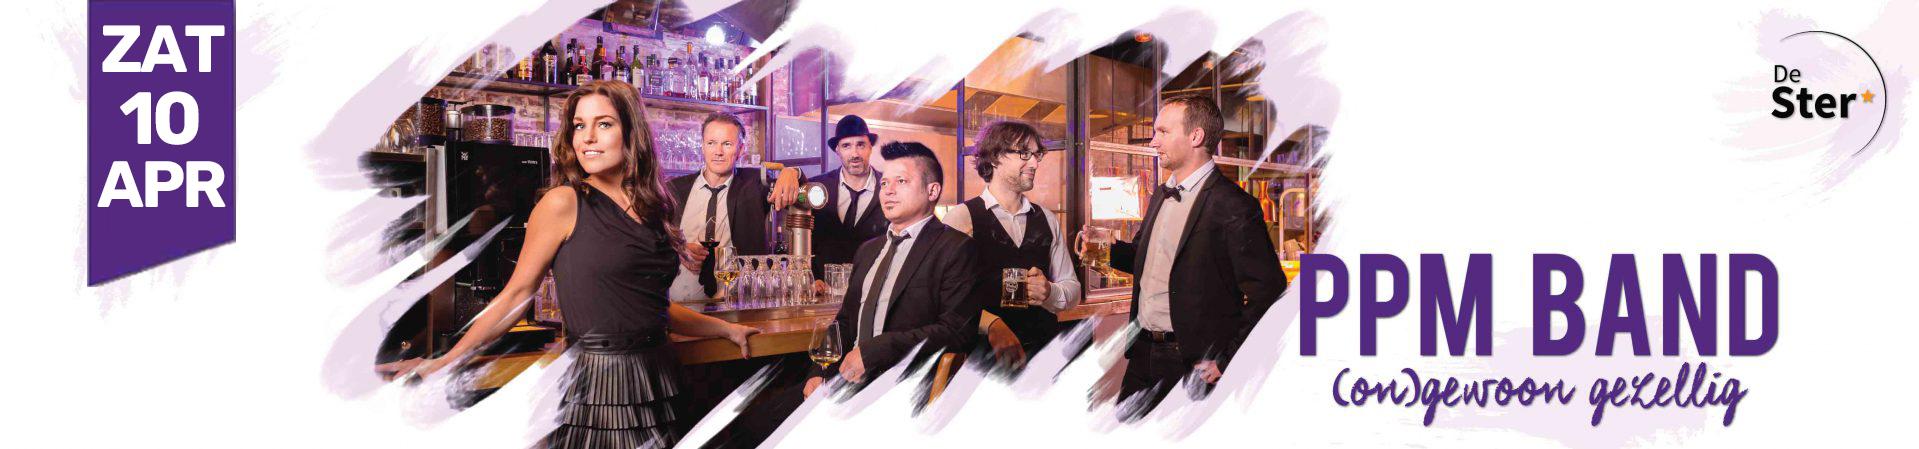 De Ster - PPM Band